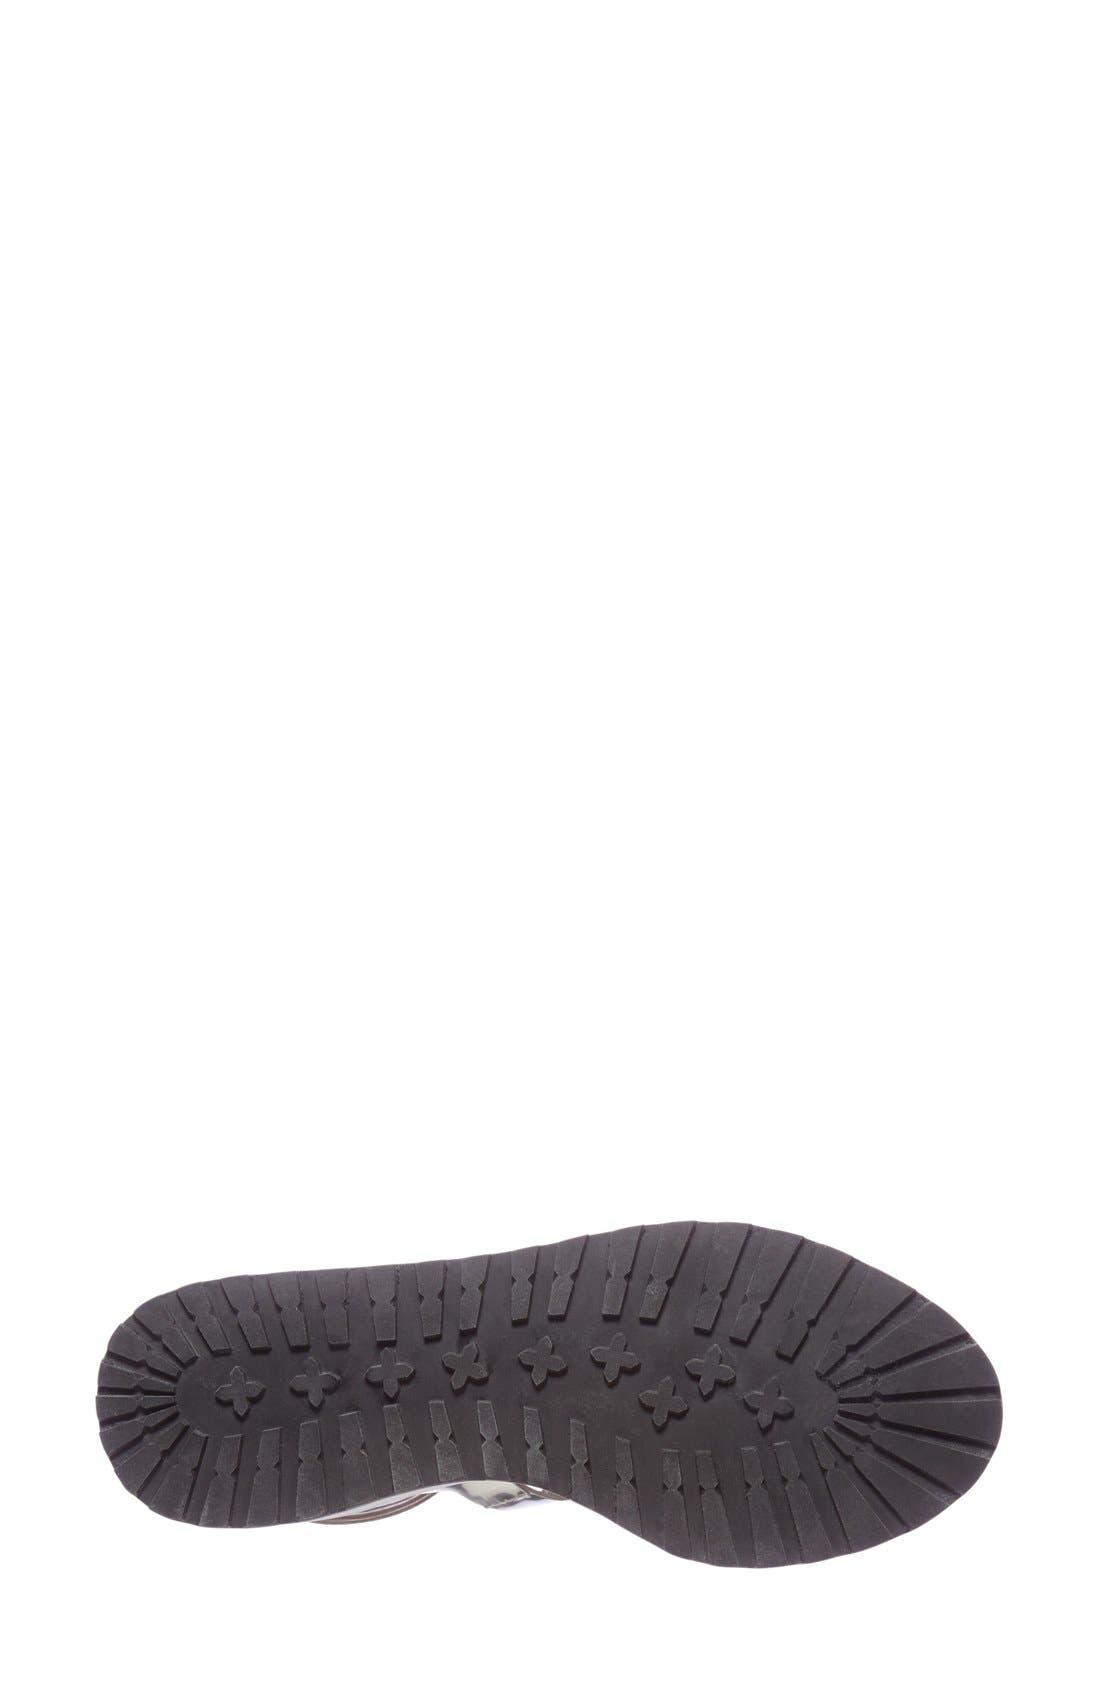 Alternate Image 4  - Loeffler Randall 'Pia' Platform Wedge Sandal (Women)